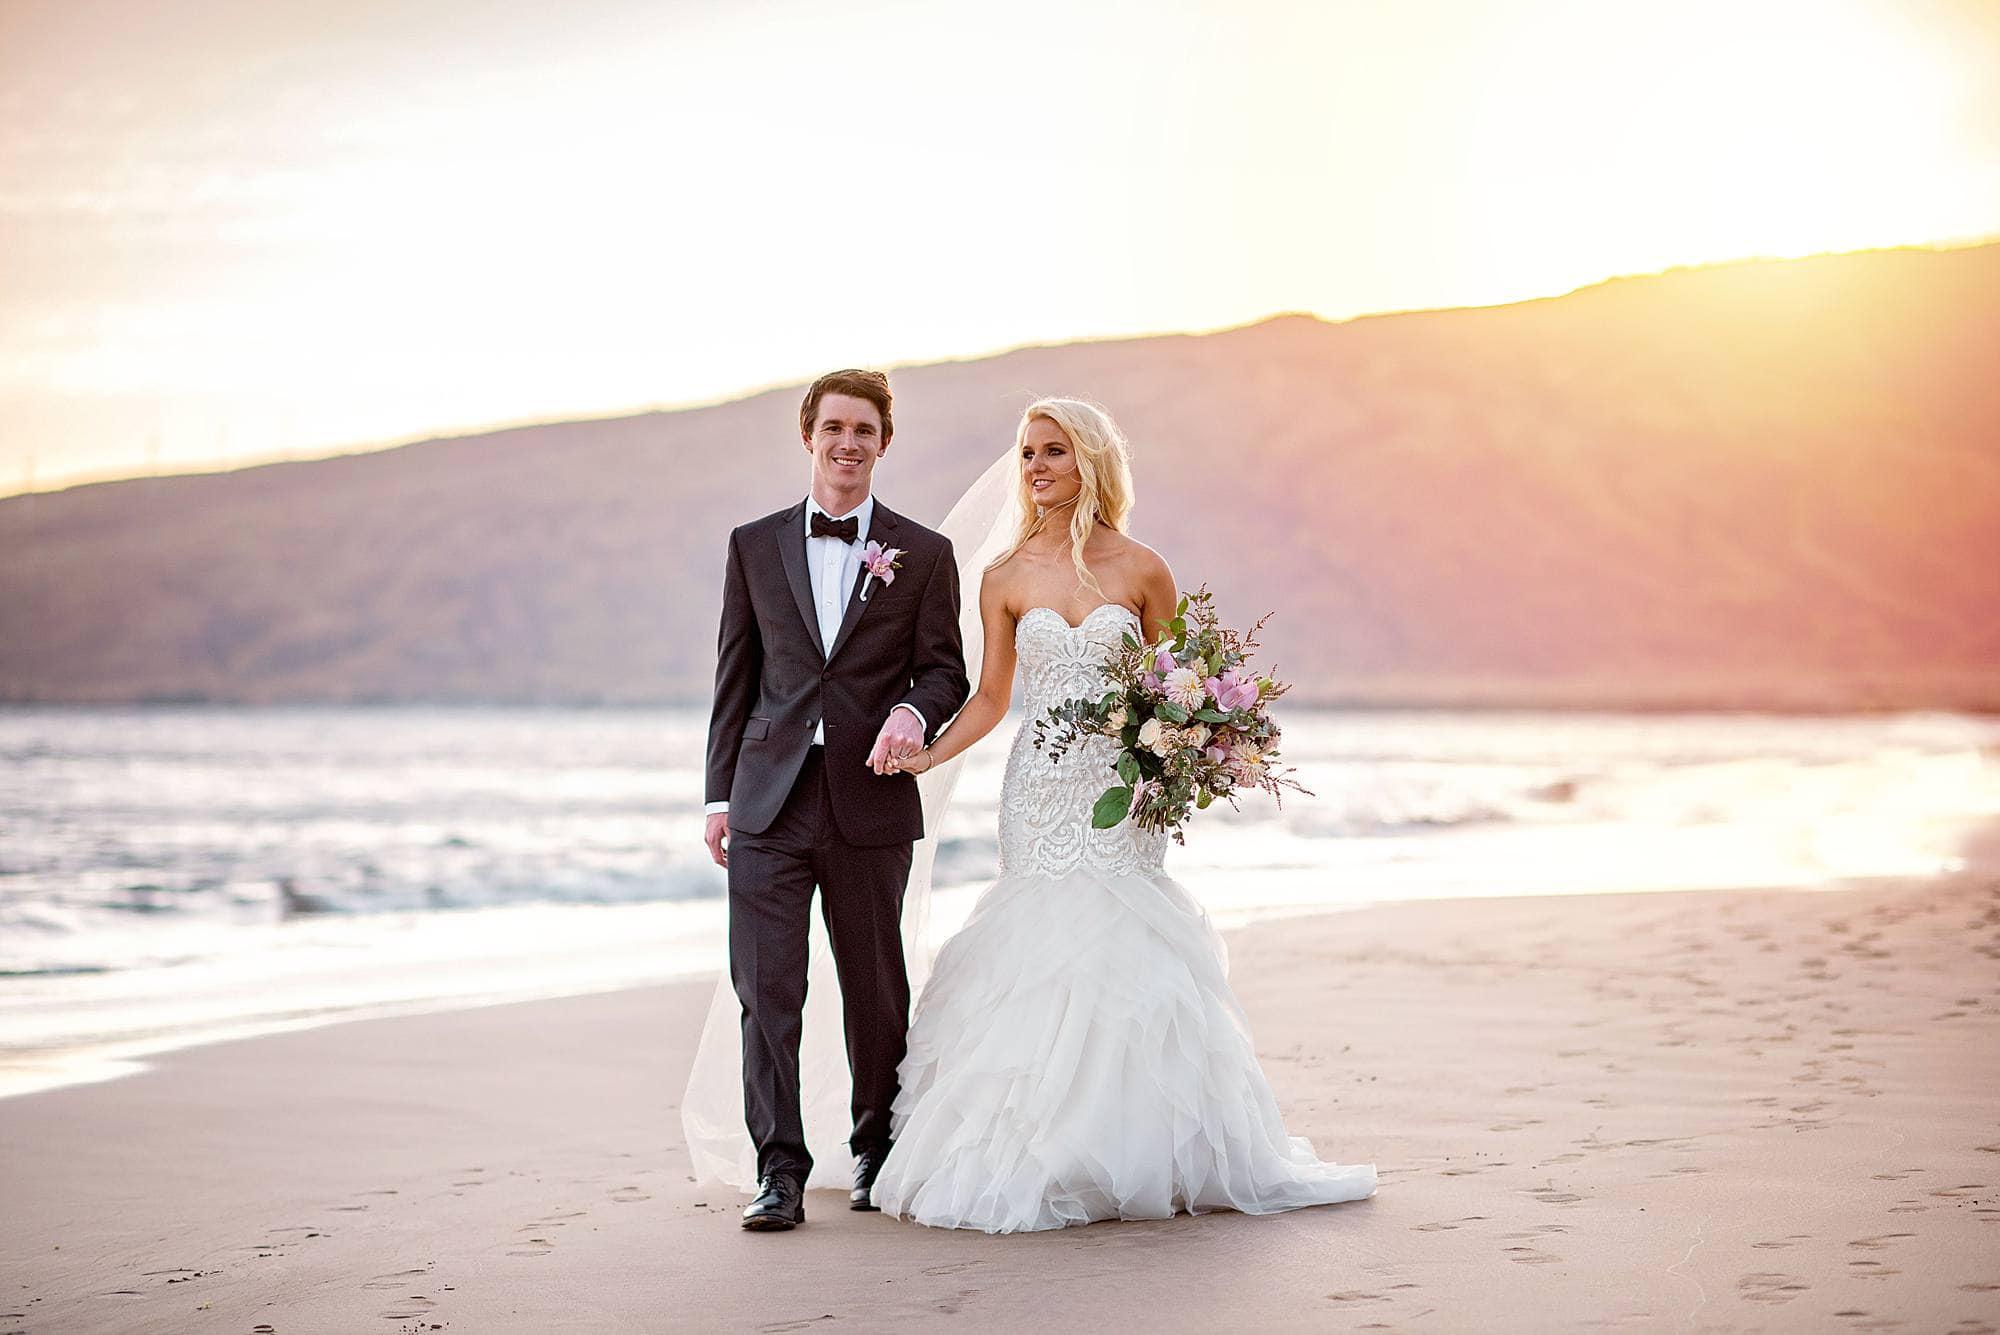 Muai On Beach Mother of Bride Dresses